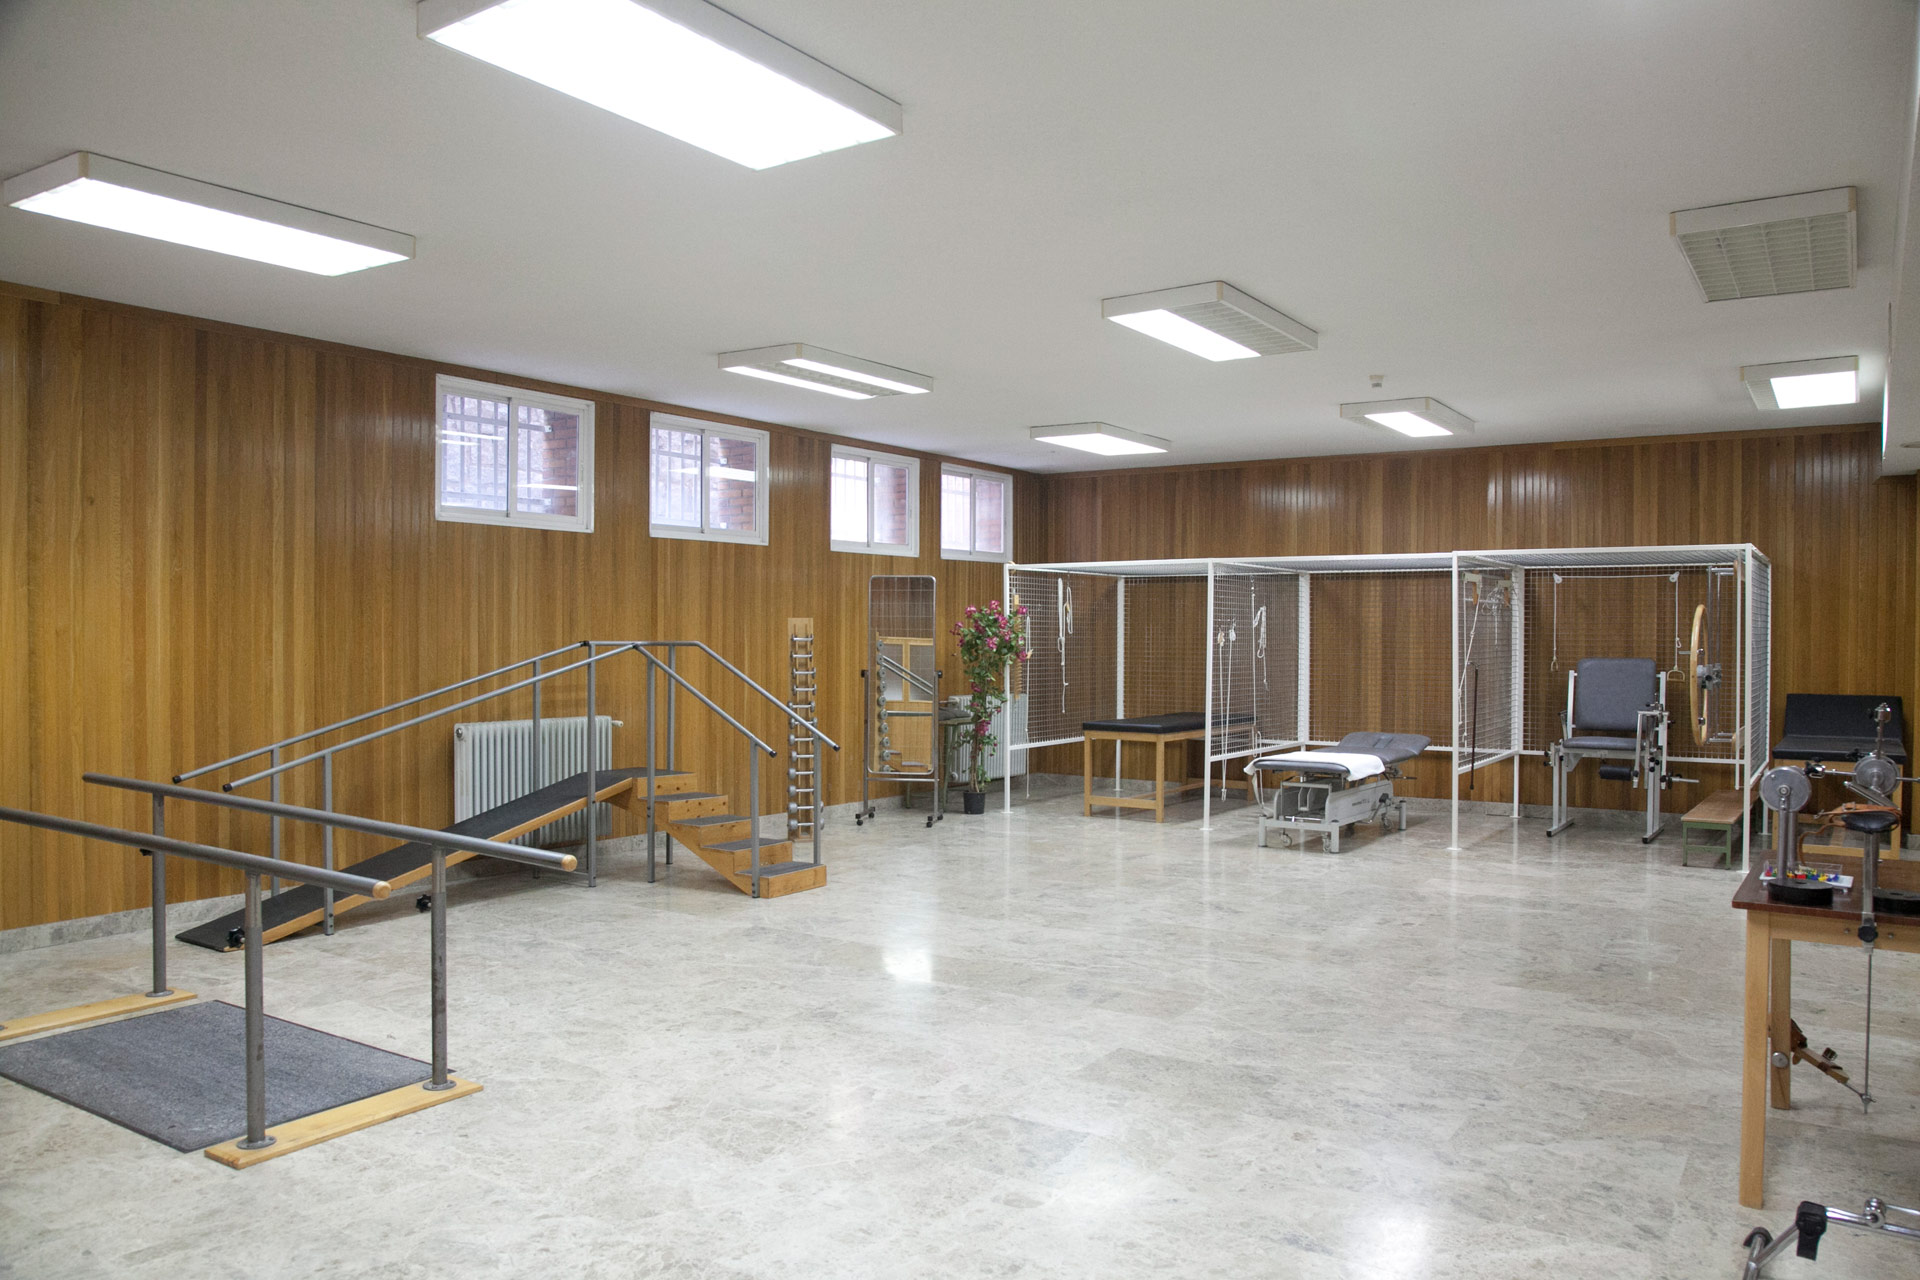 gimnasio3